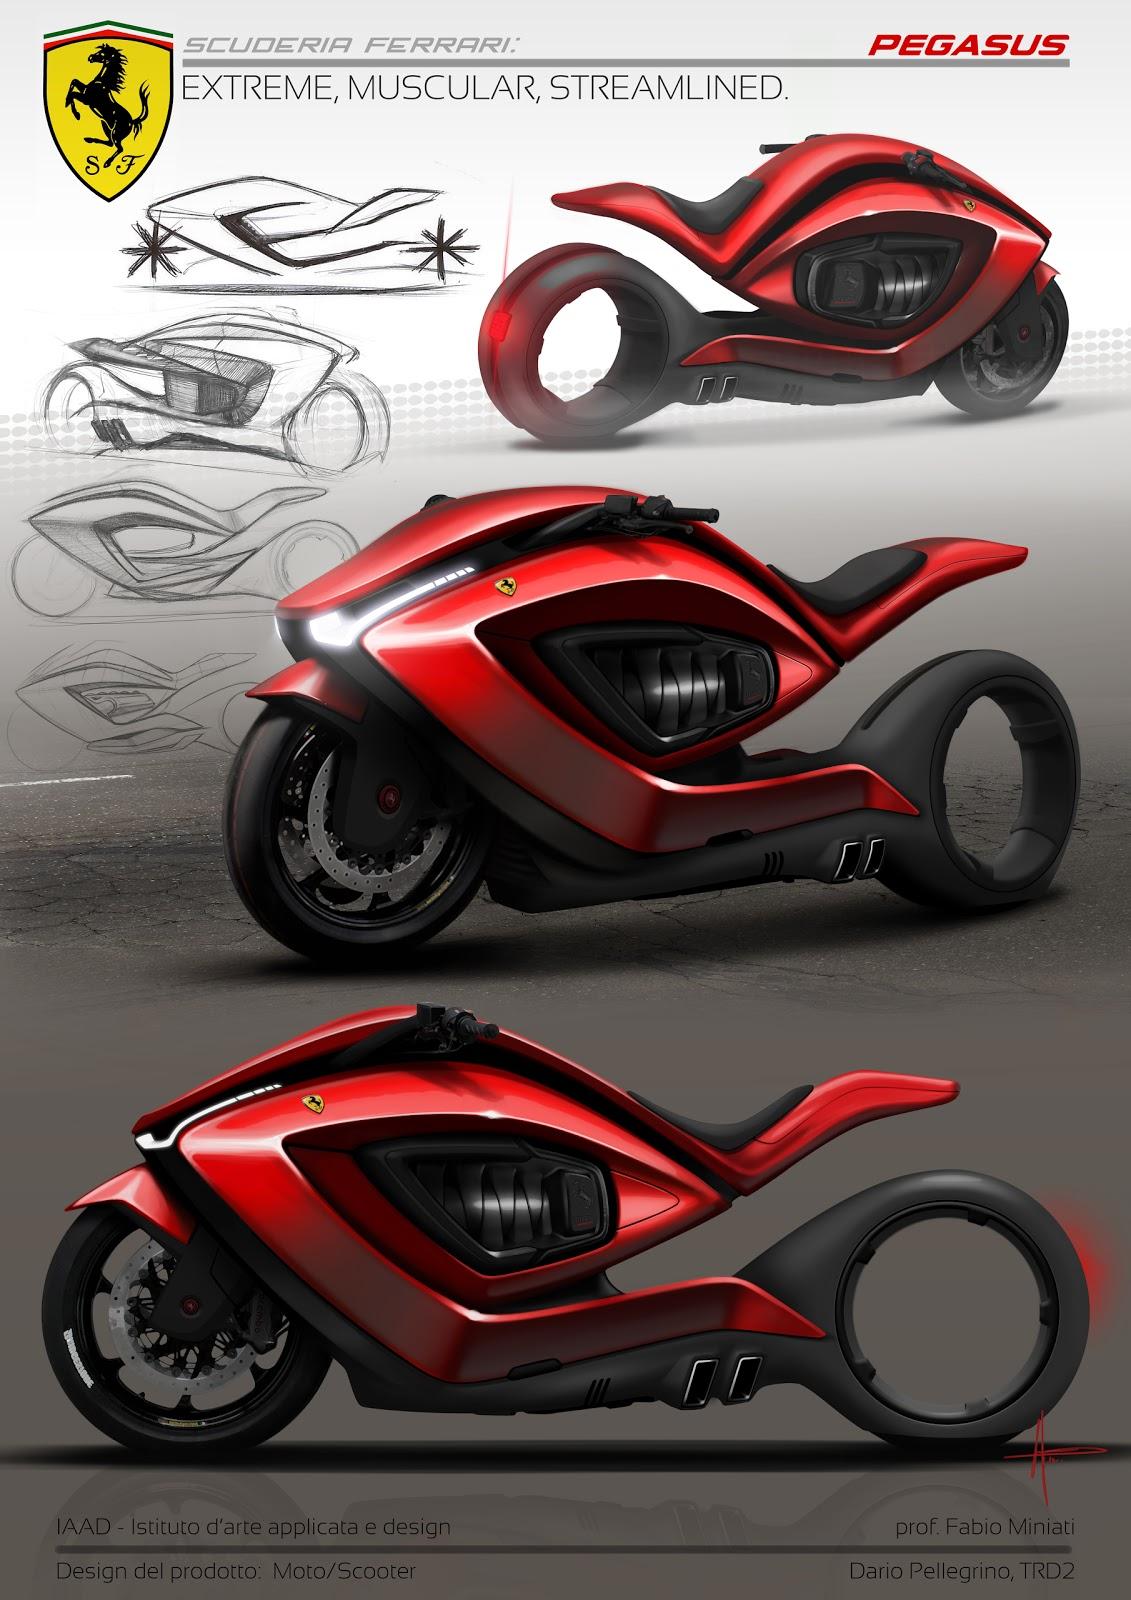 Ferrari Motorcycle 201...